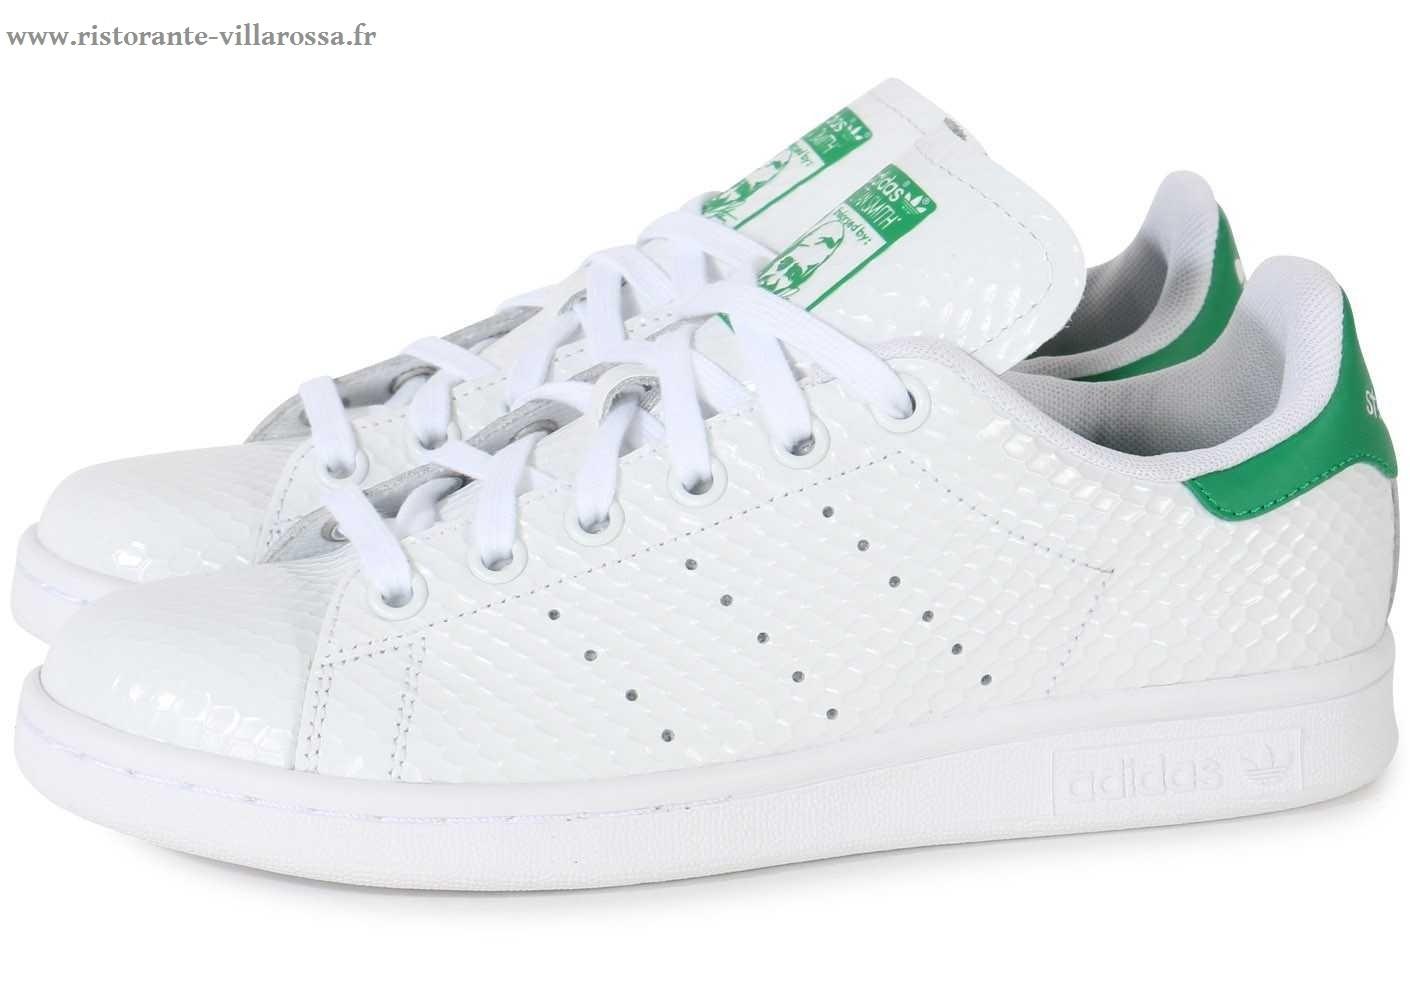 adidas superstar vert homme